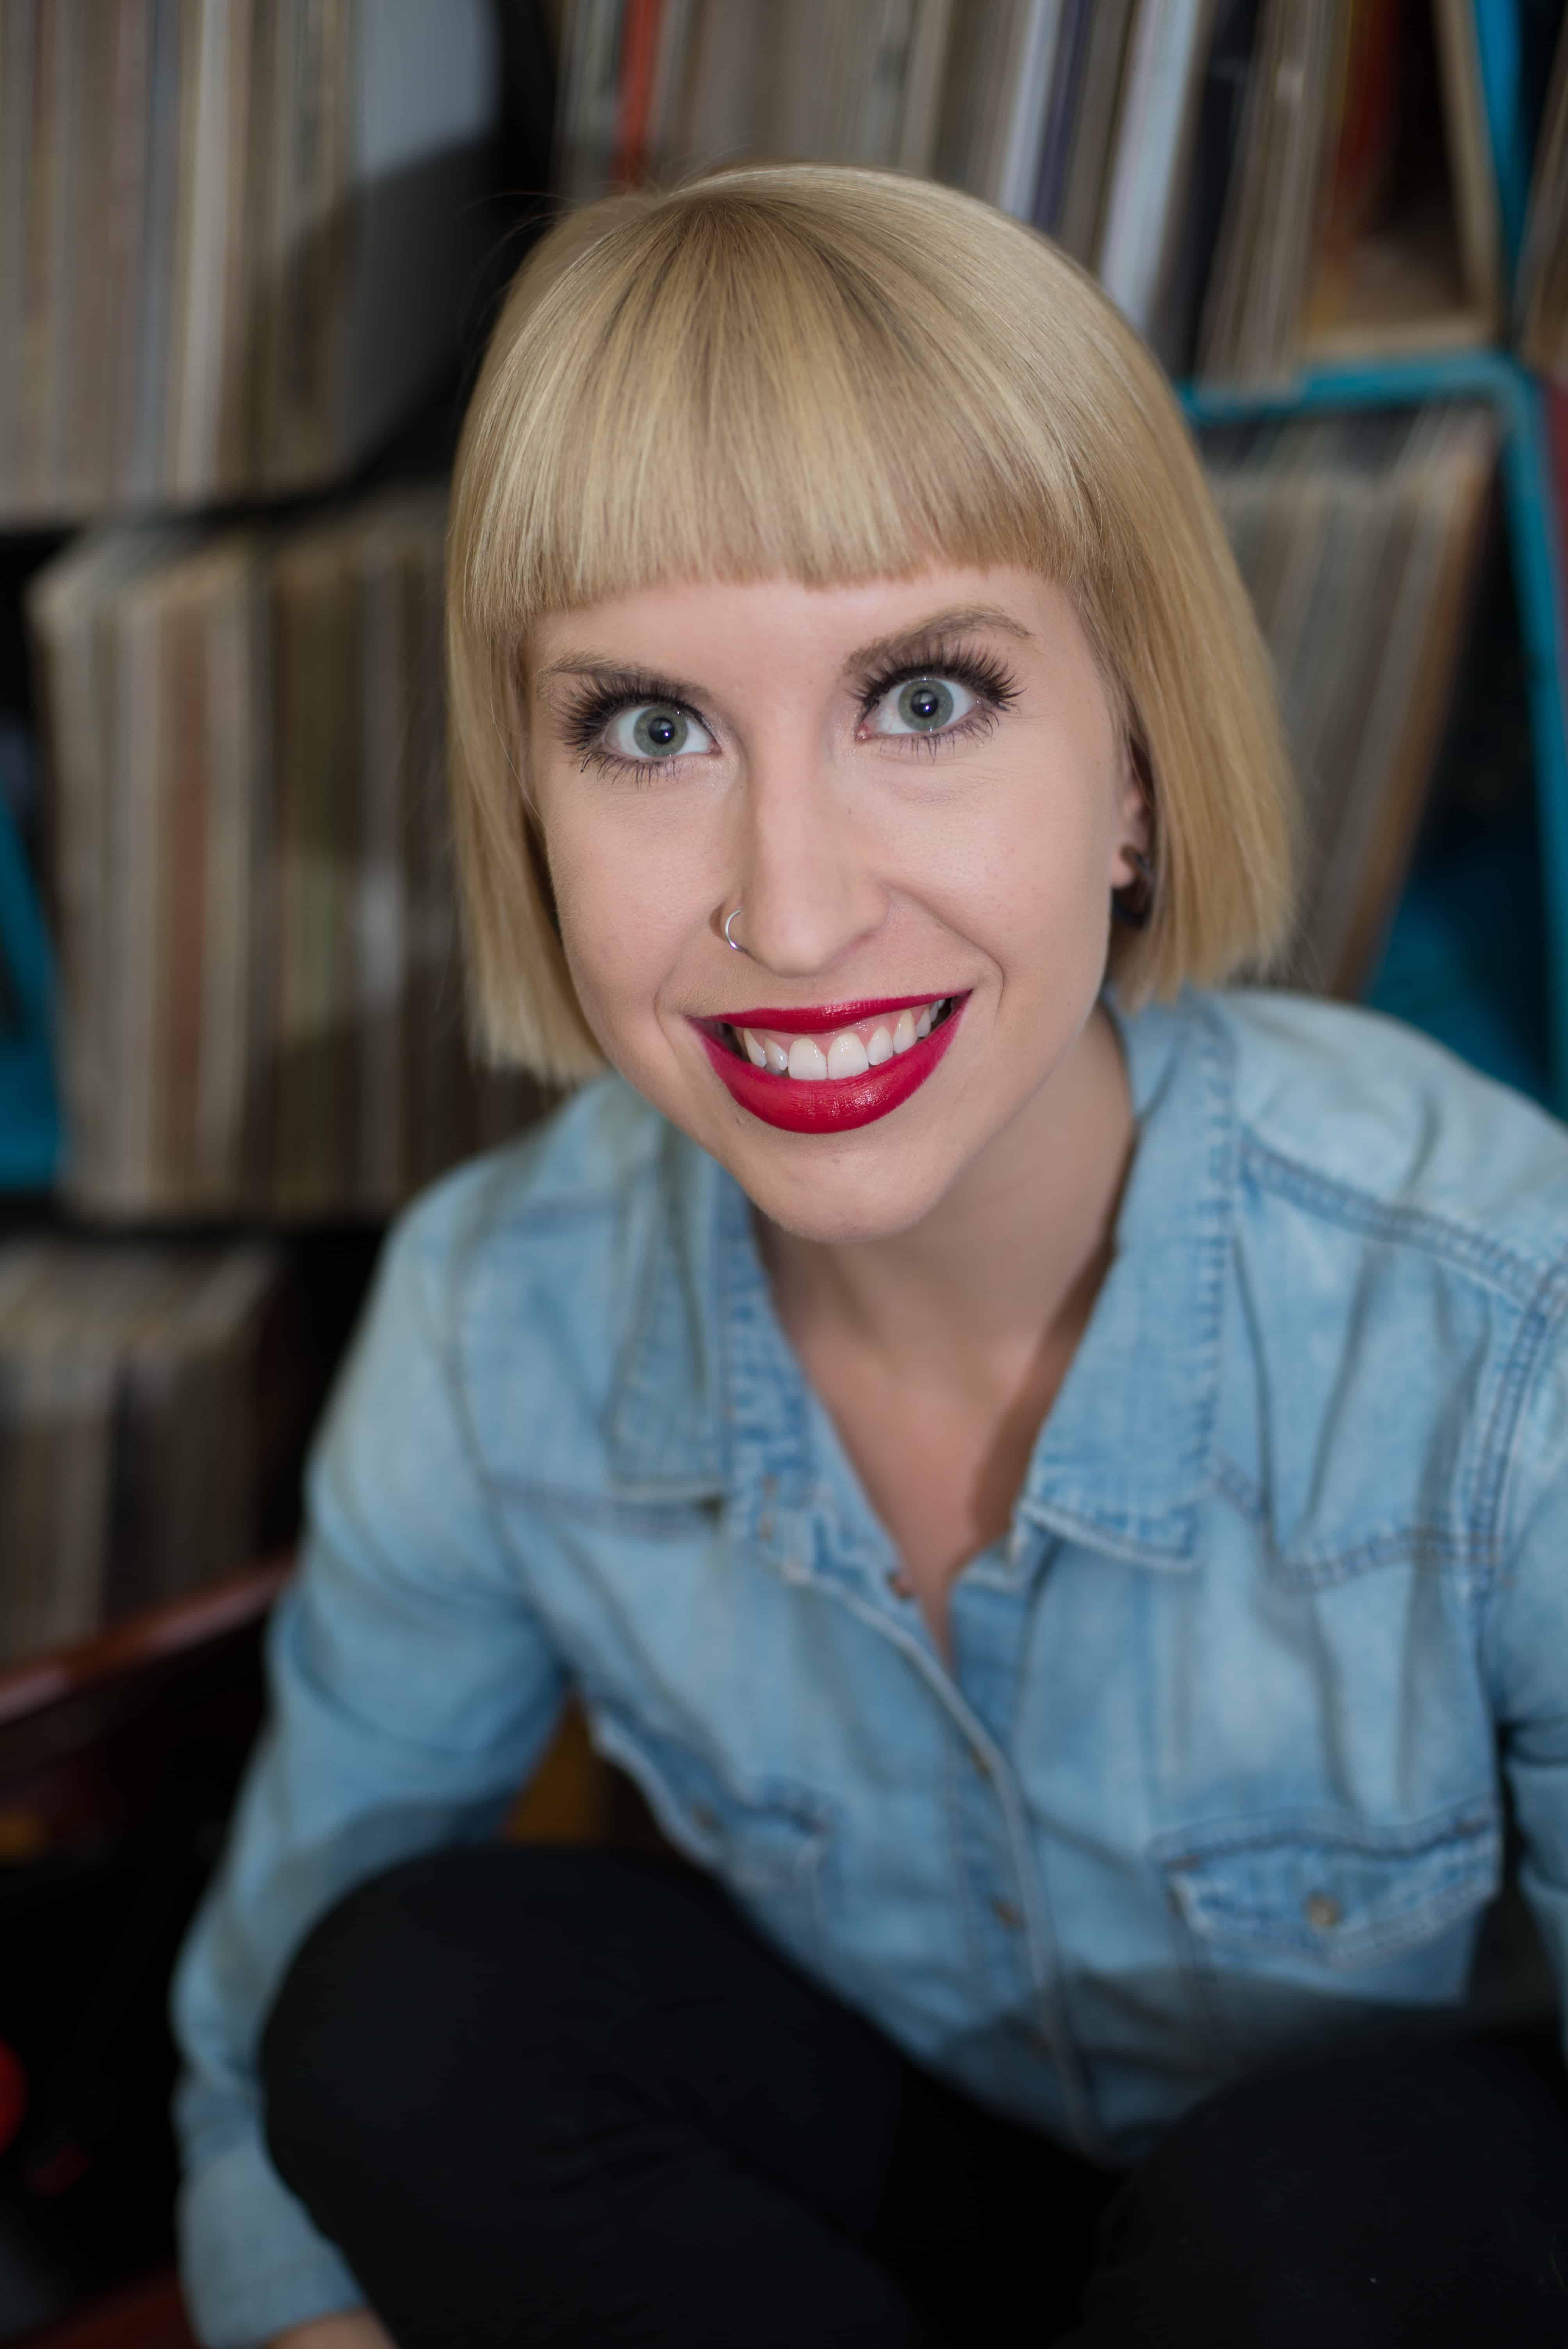 Gianna Michaels Closet POV Blowjob Tugjob Facial | Горска Вода